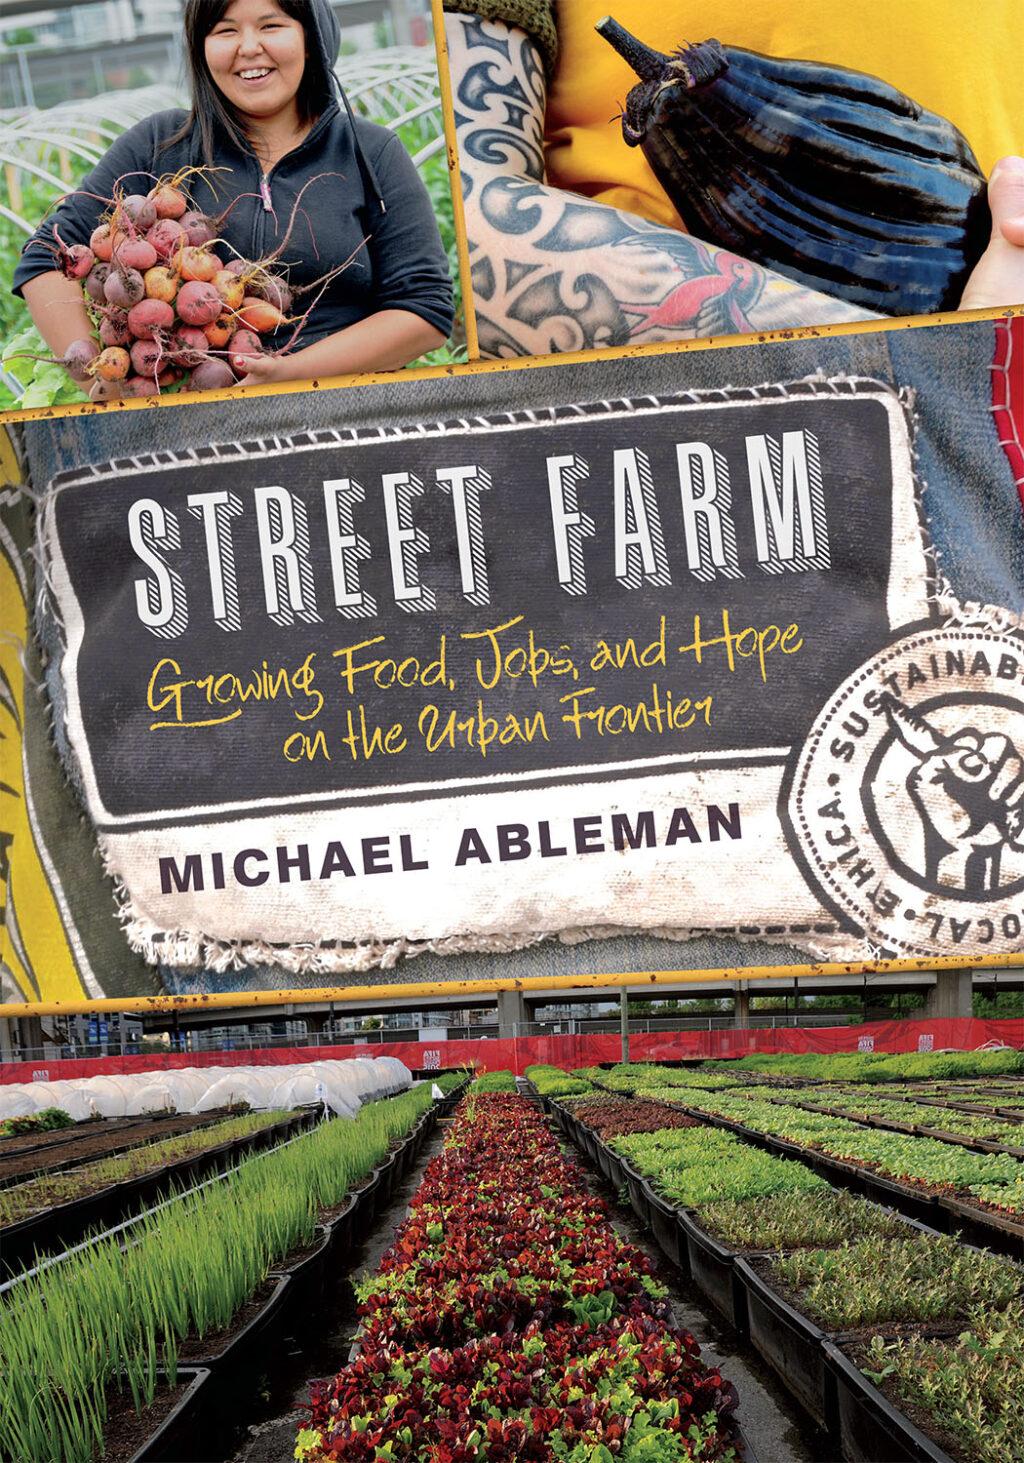 The Street Farm cover